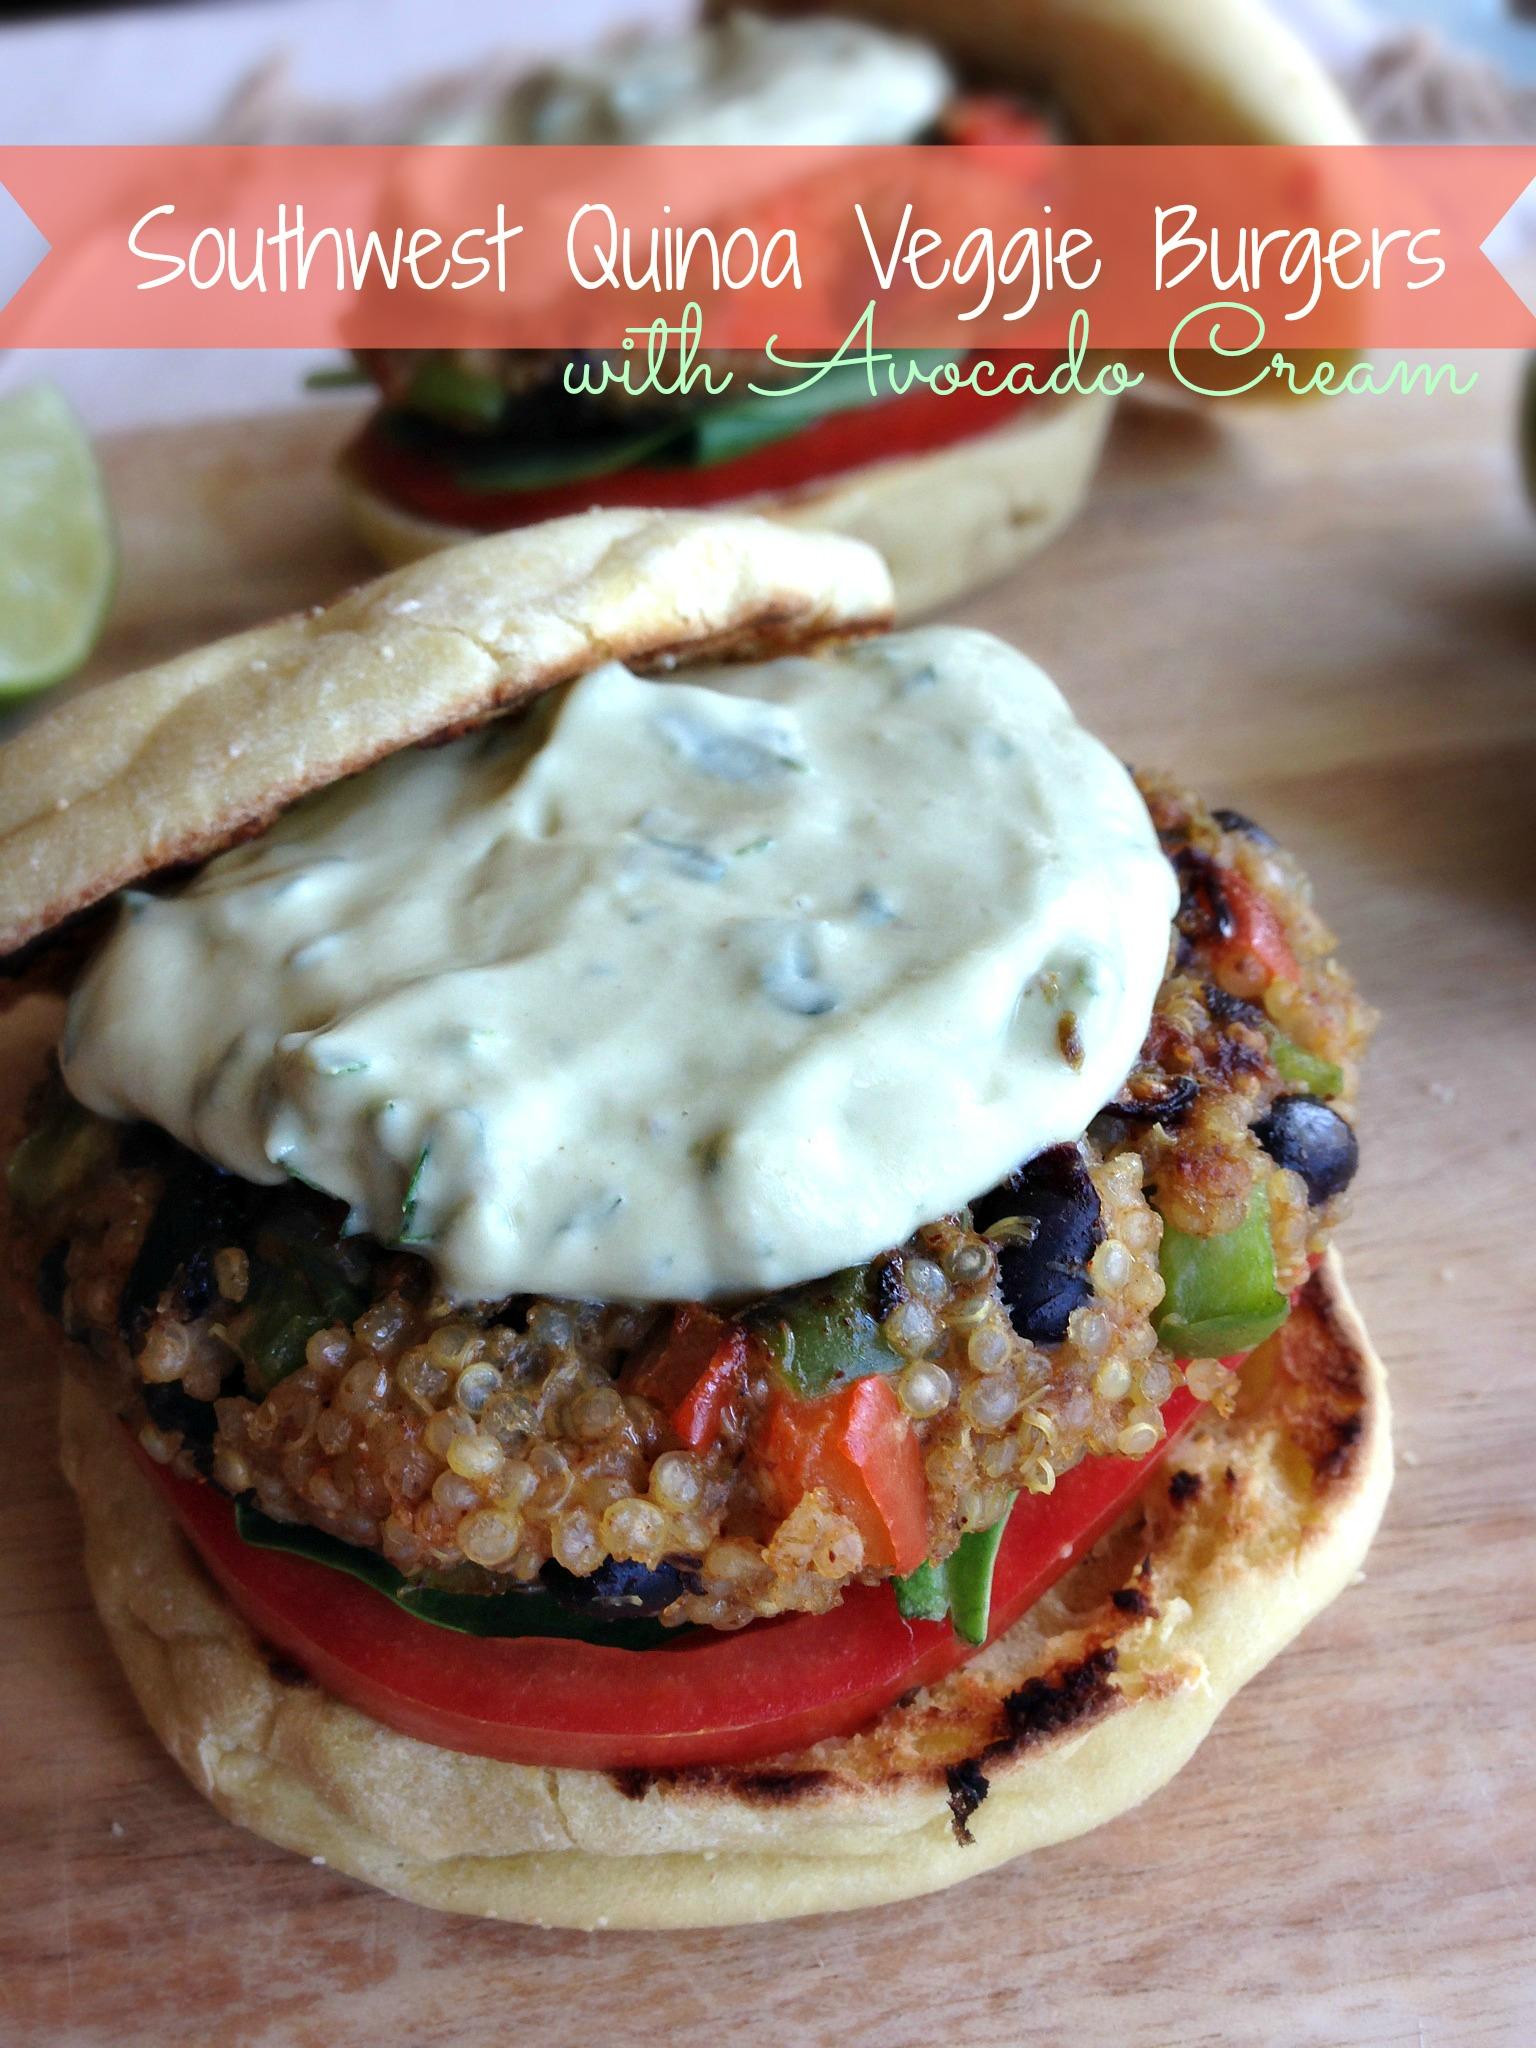 Southwest Quinoa Veggie Burgers with Avocado Cream